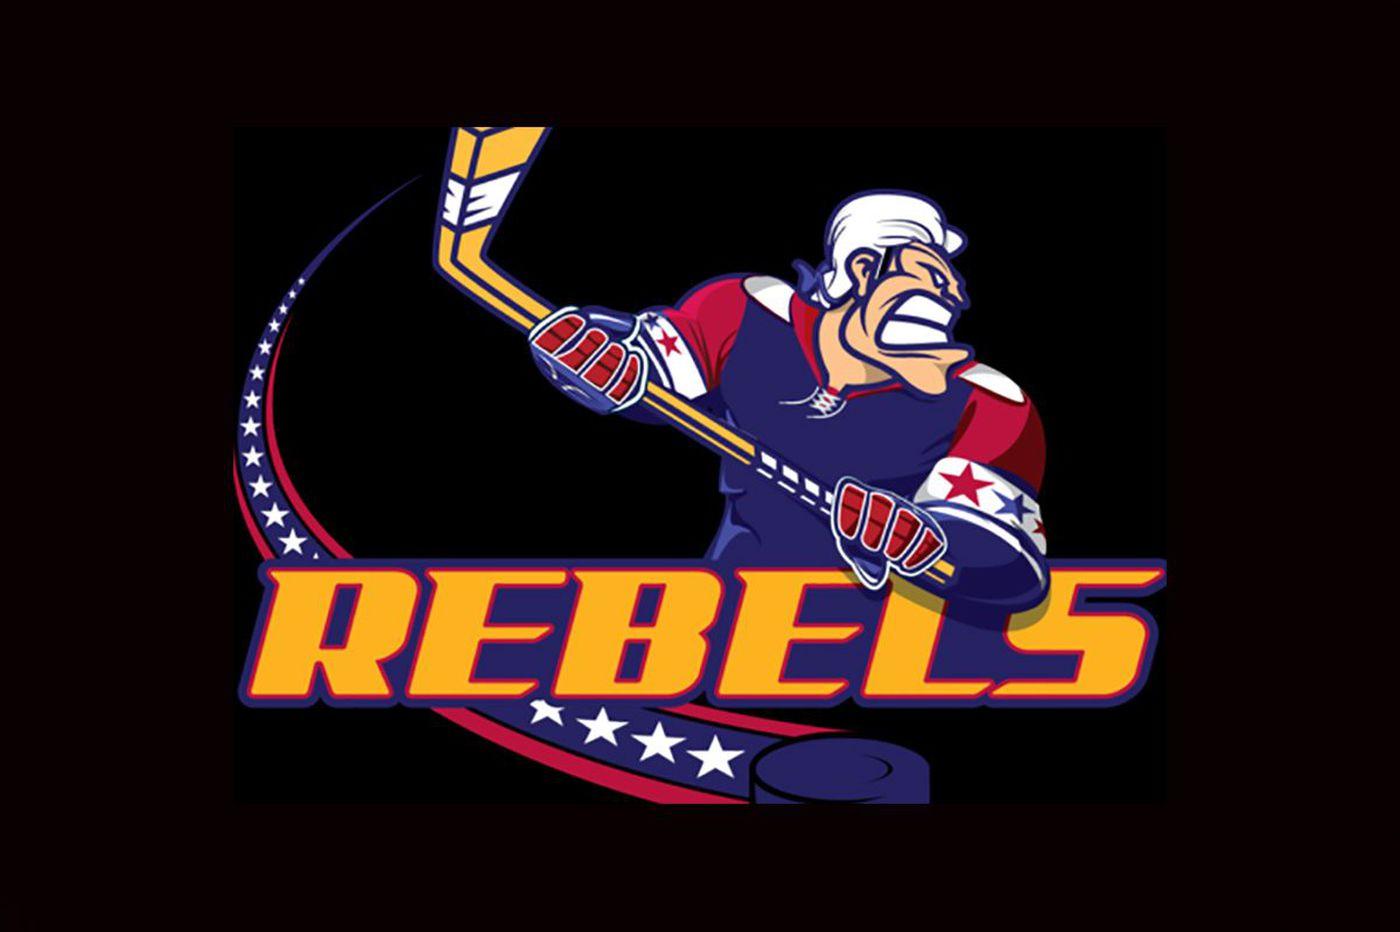 Junior hockey league's Rebels moving to Philadelphia